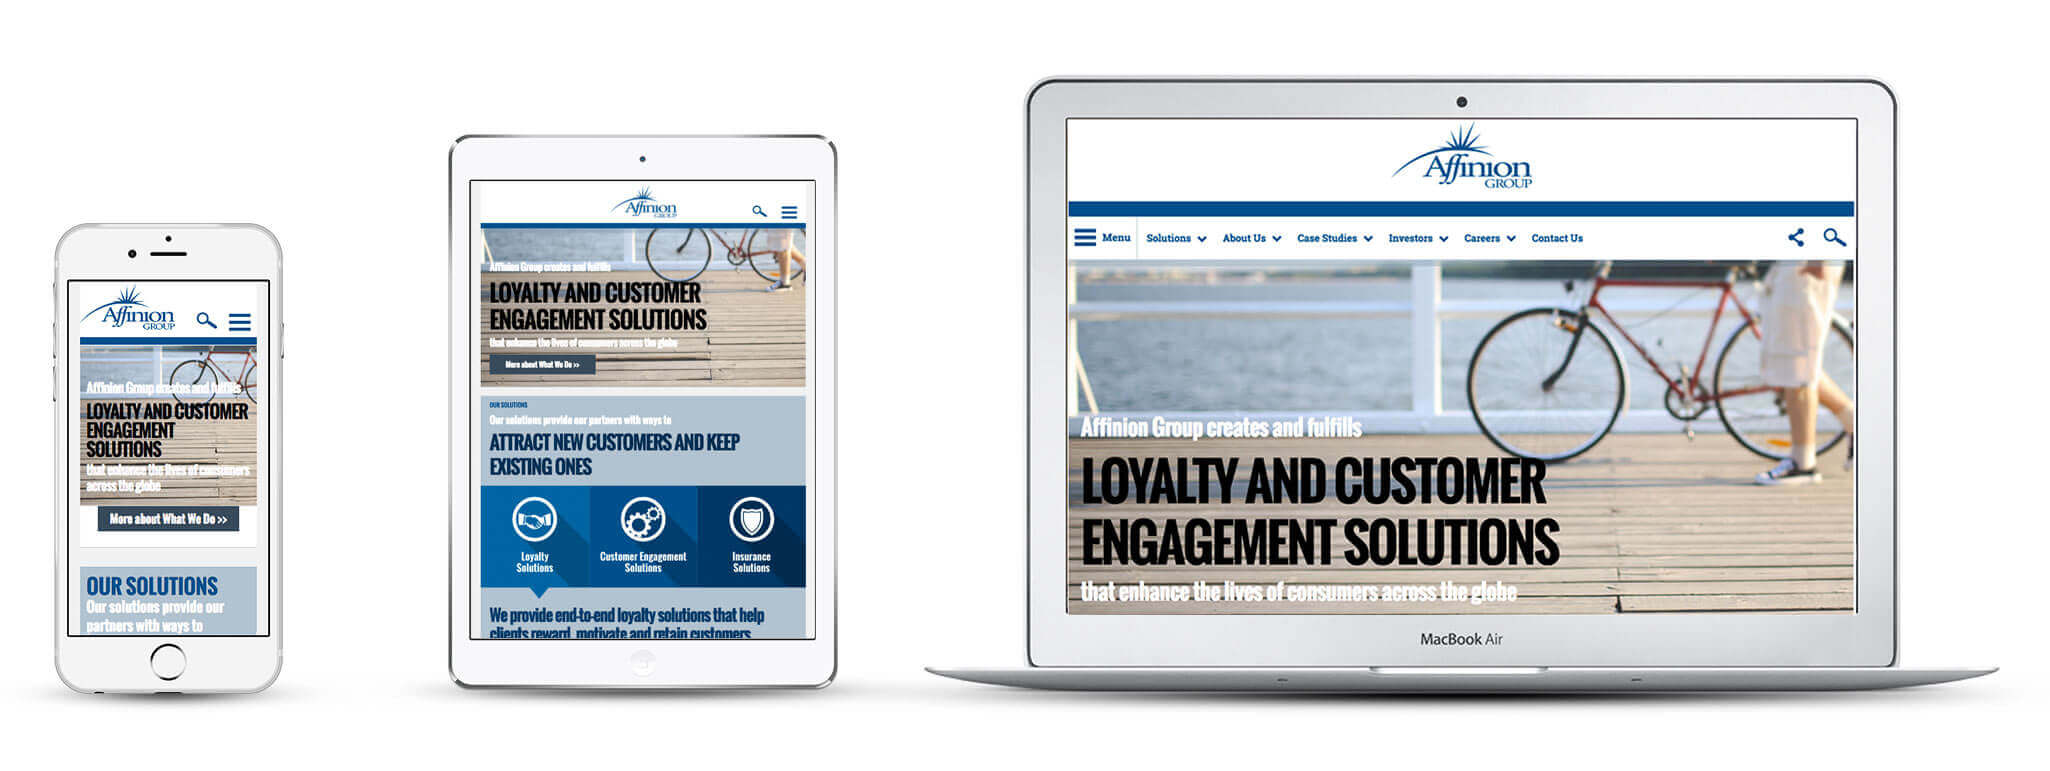 Echidna Affinion Website Design Across Devices